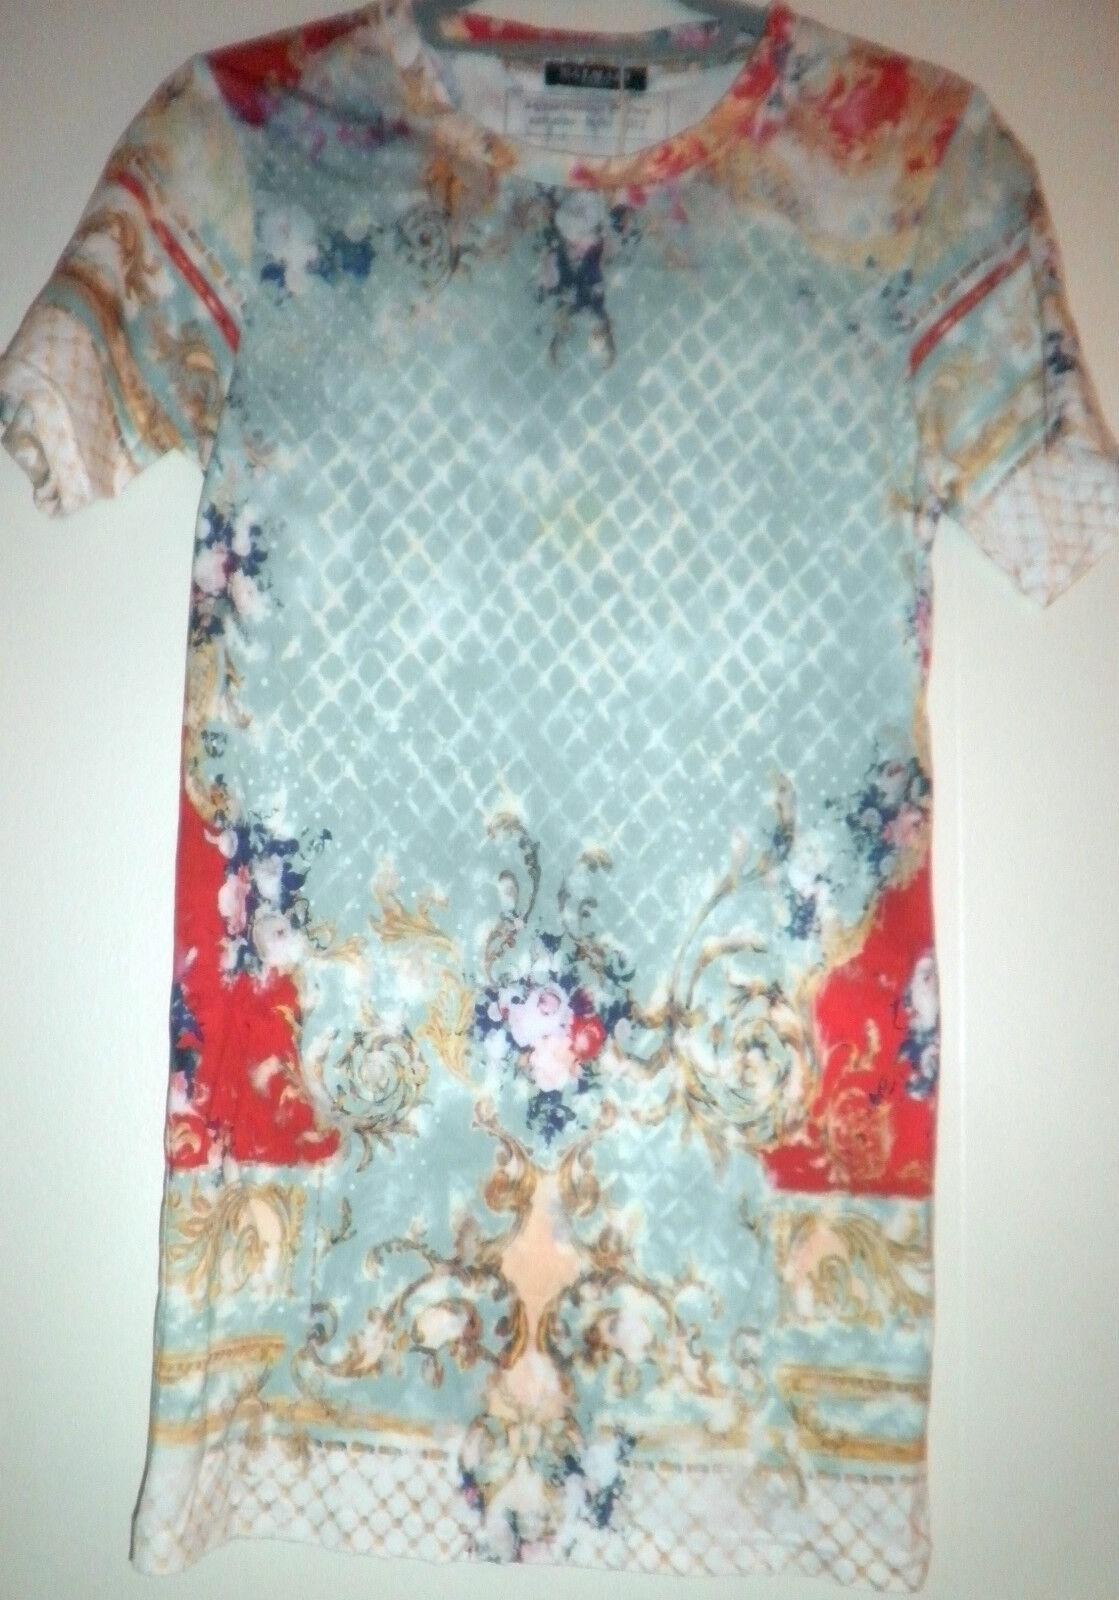 BALMAIN Floral Print T-Shirt SZ 36 = Fits US S - NWOT